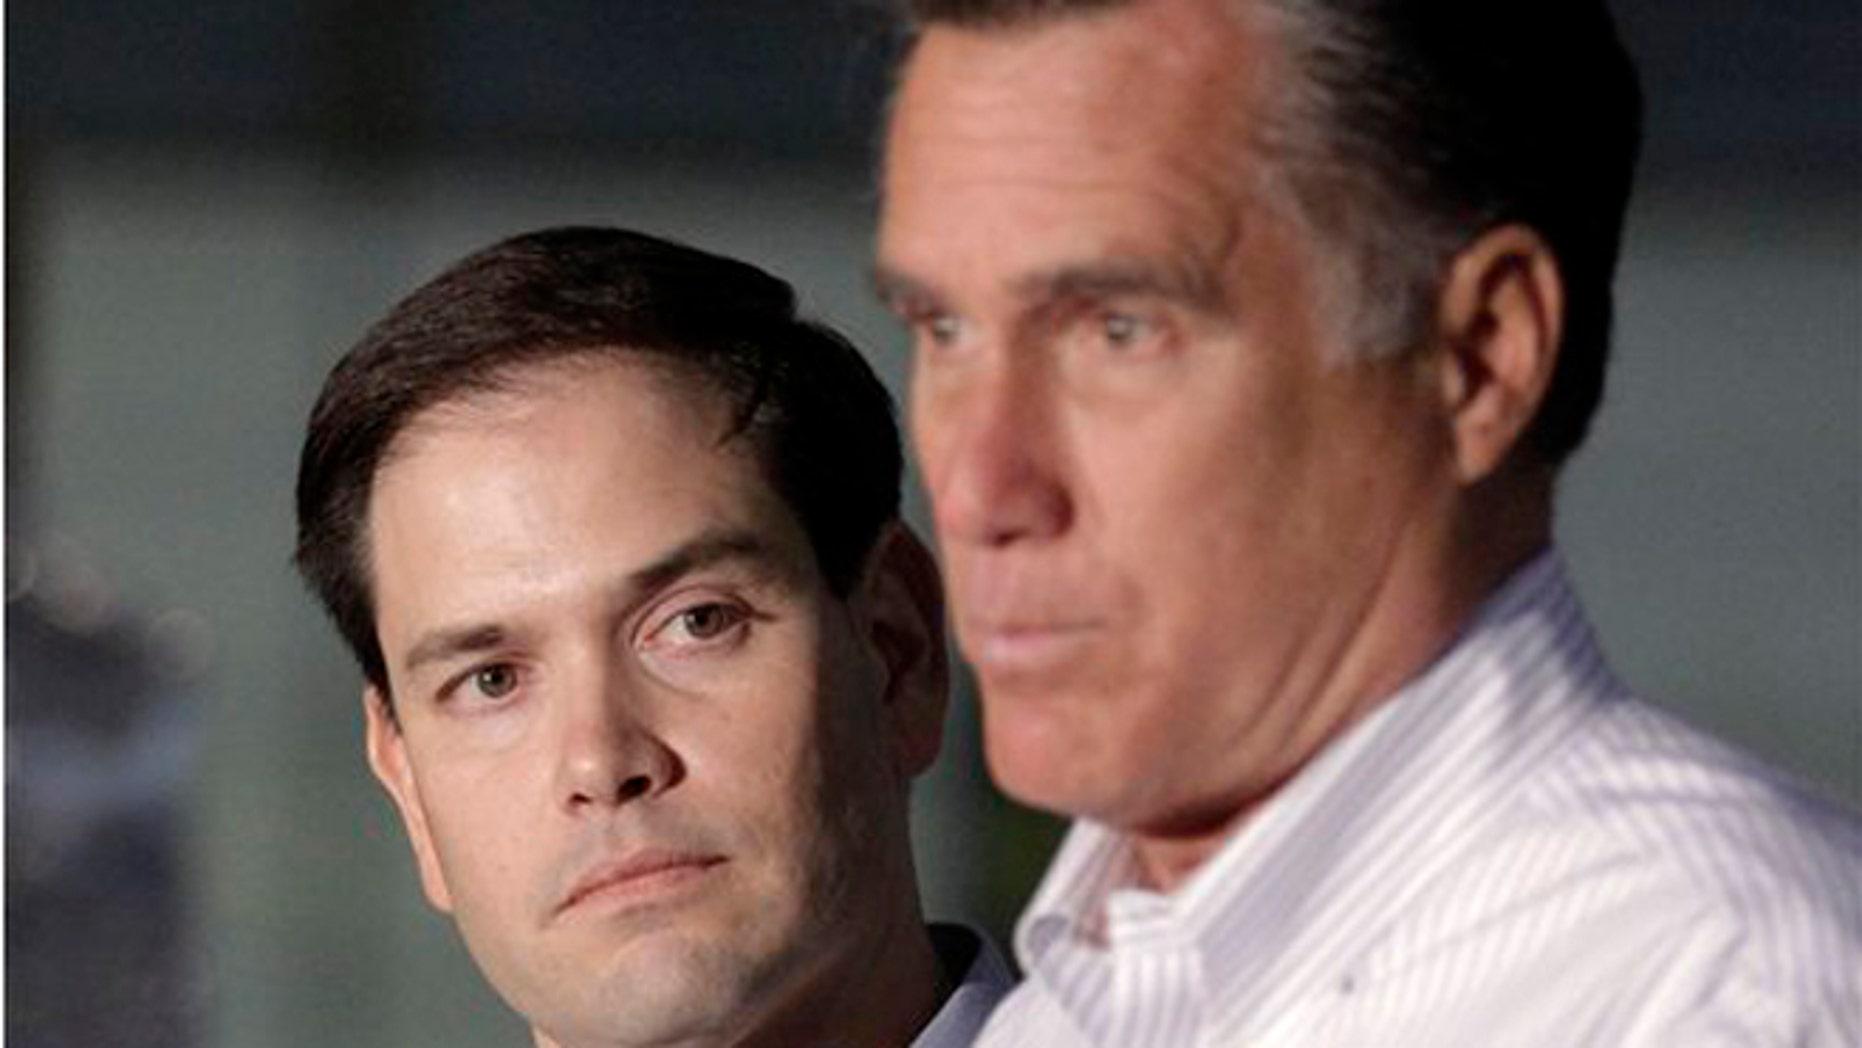 2012: Sen. Marco Rubio, R-Fla. listens at left as GOP presidential candidate Mitt Romney speaks in Aston, Pa.